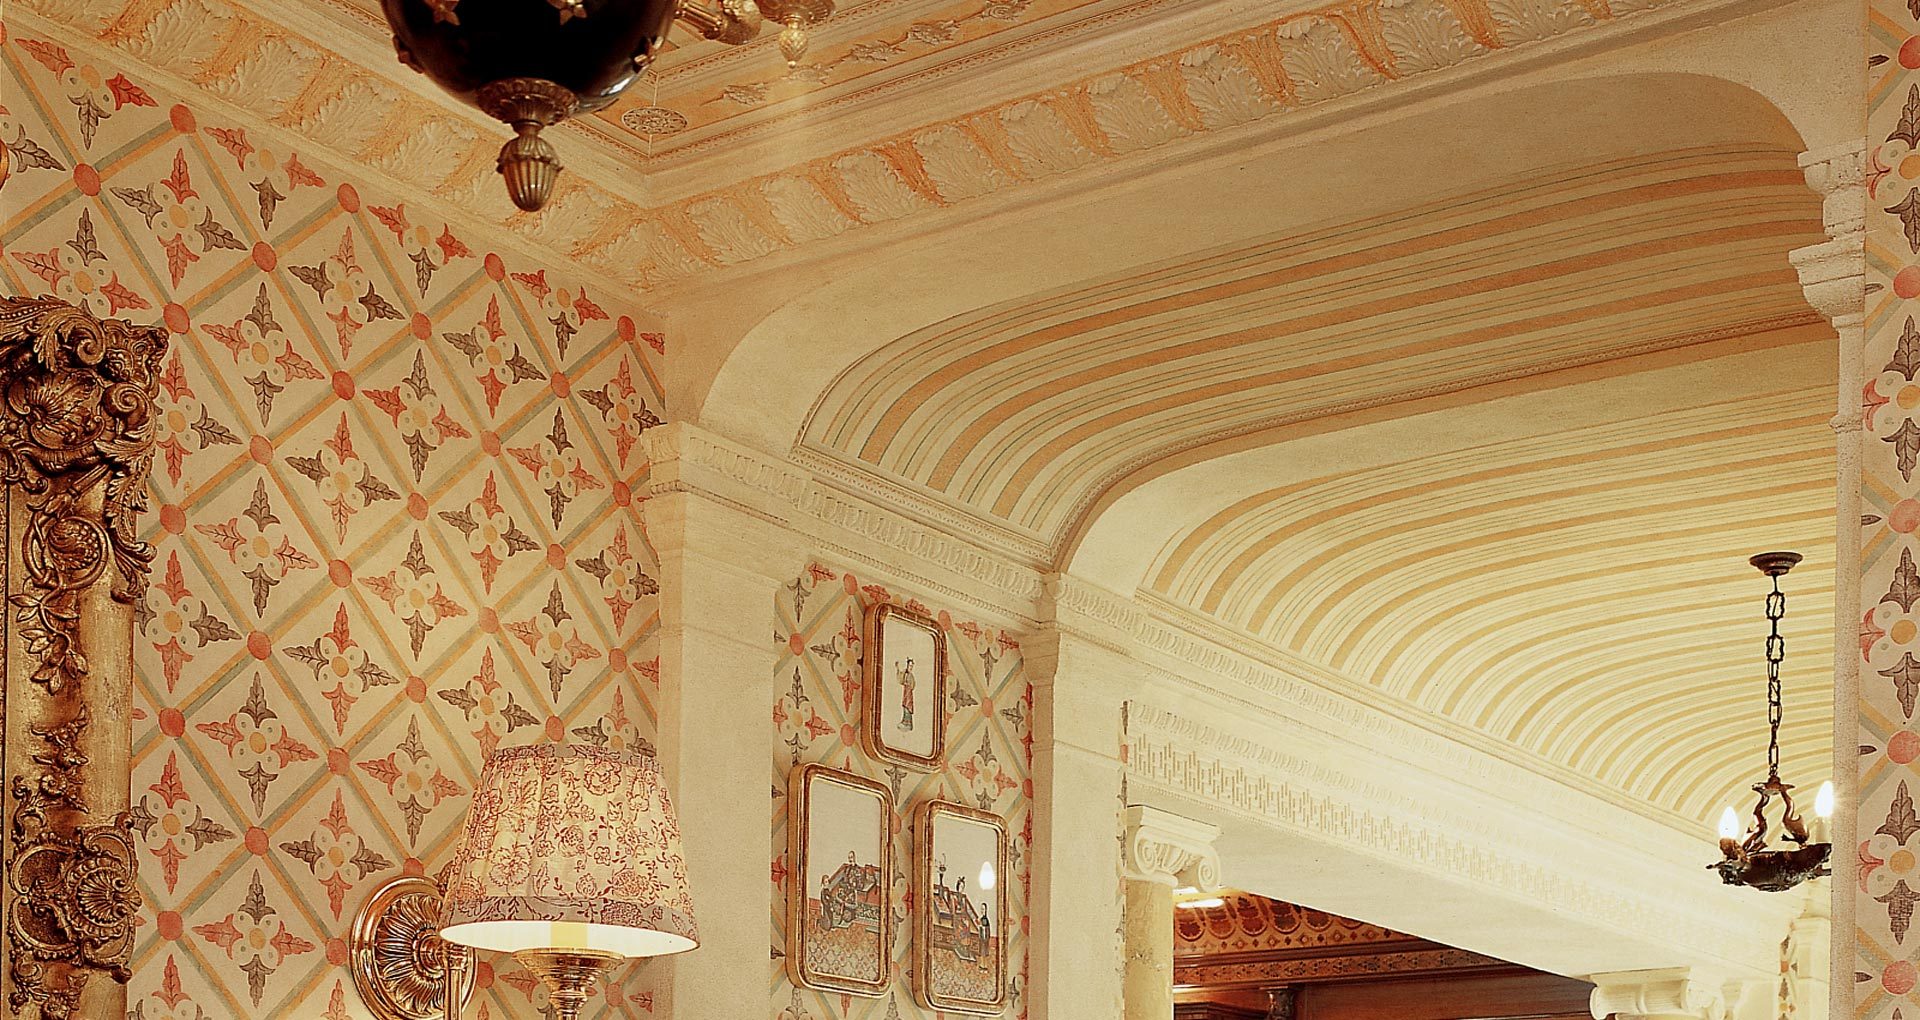 Radici-Hallway-Ceiling-CDA_01